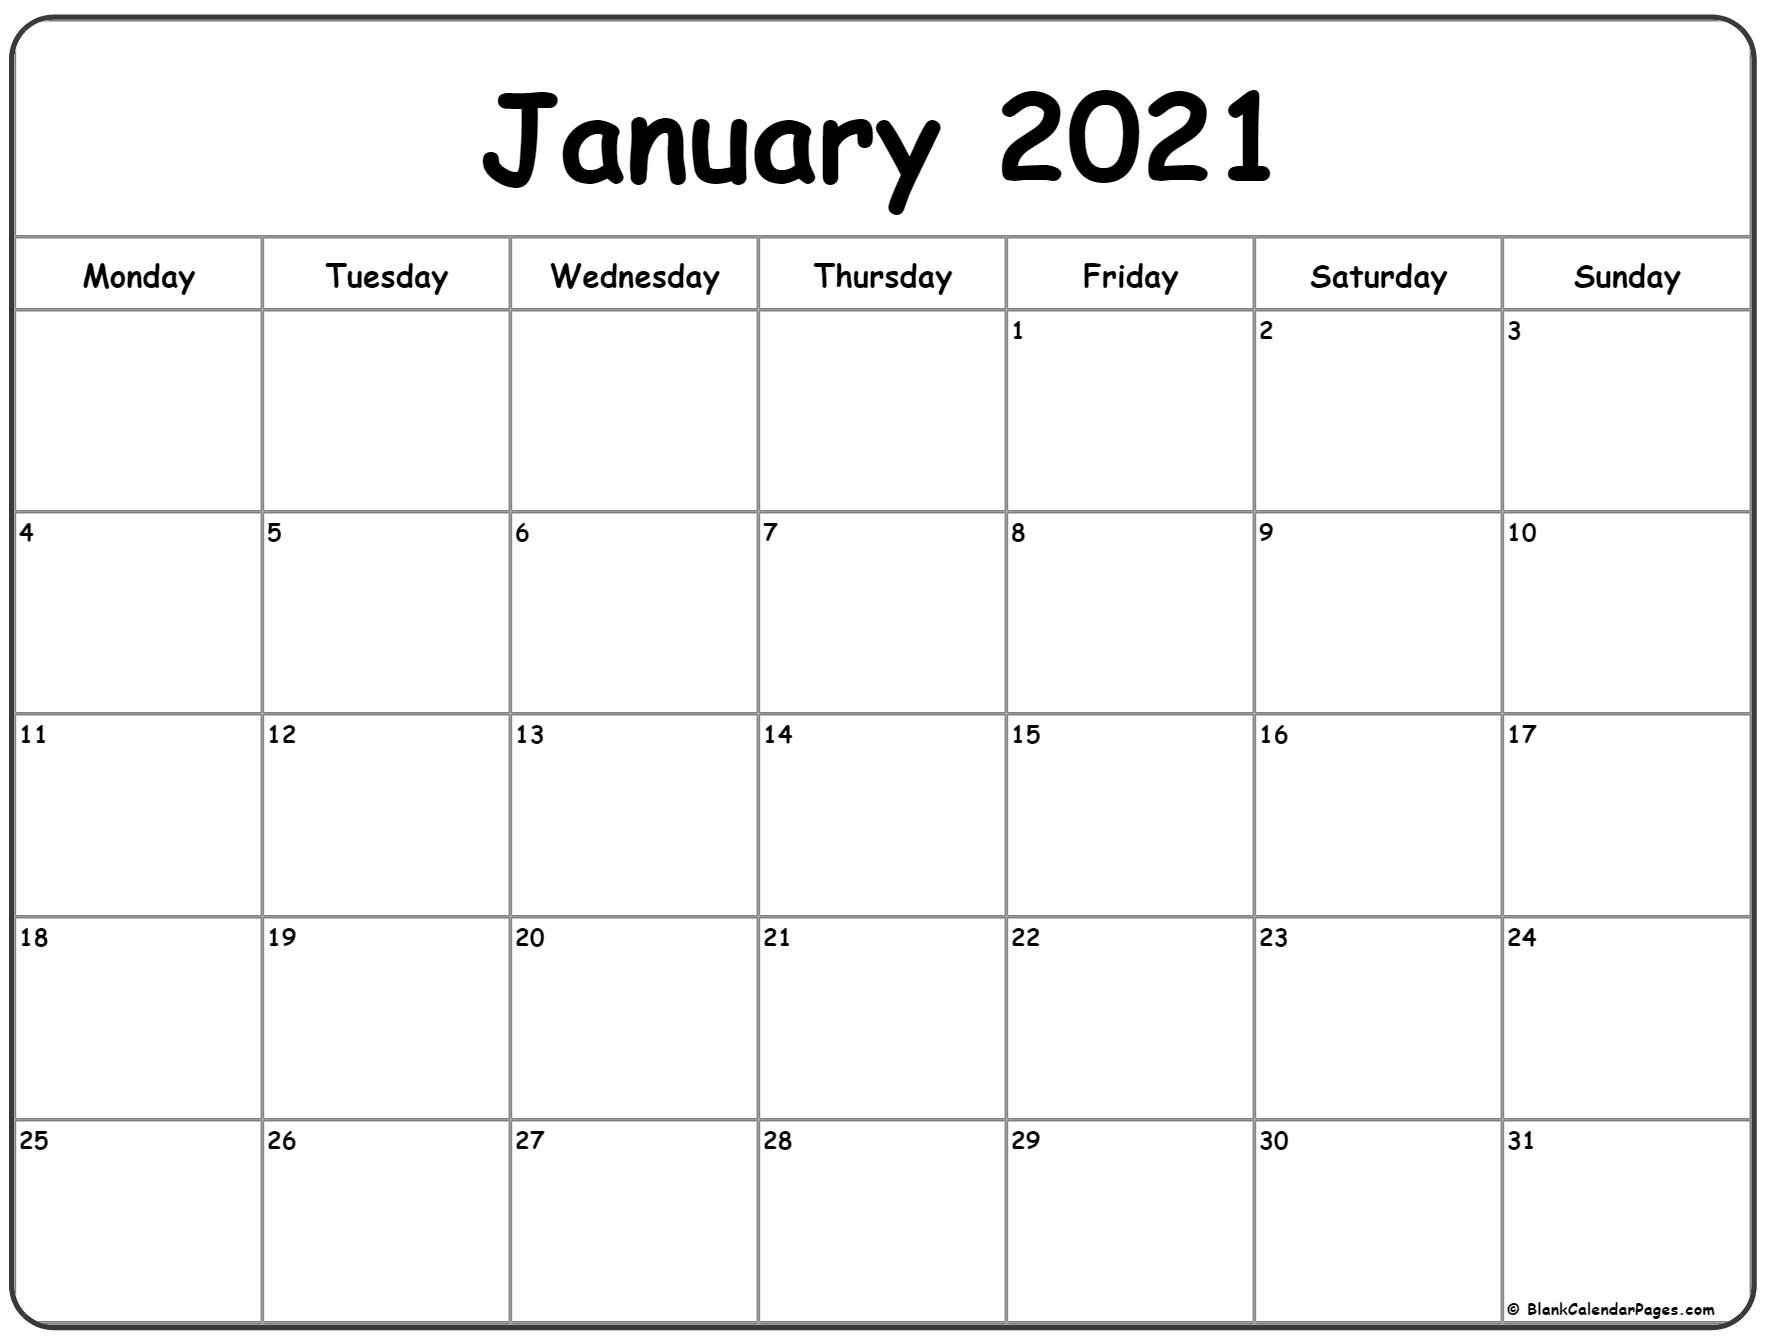 January 2021 Monday Calendar | Monday To Sunday Free Printable Monday To Friday Calendars